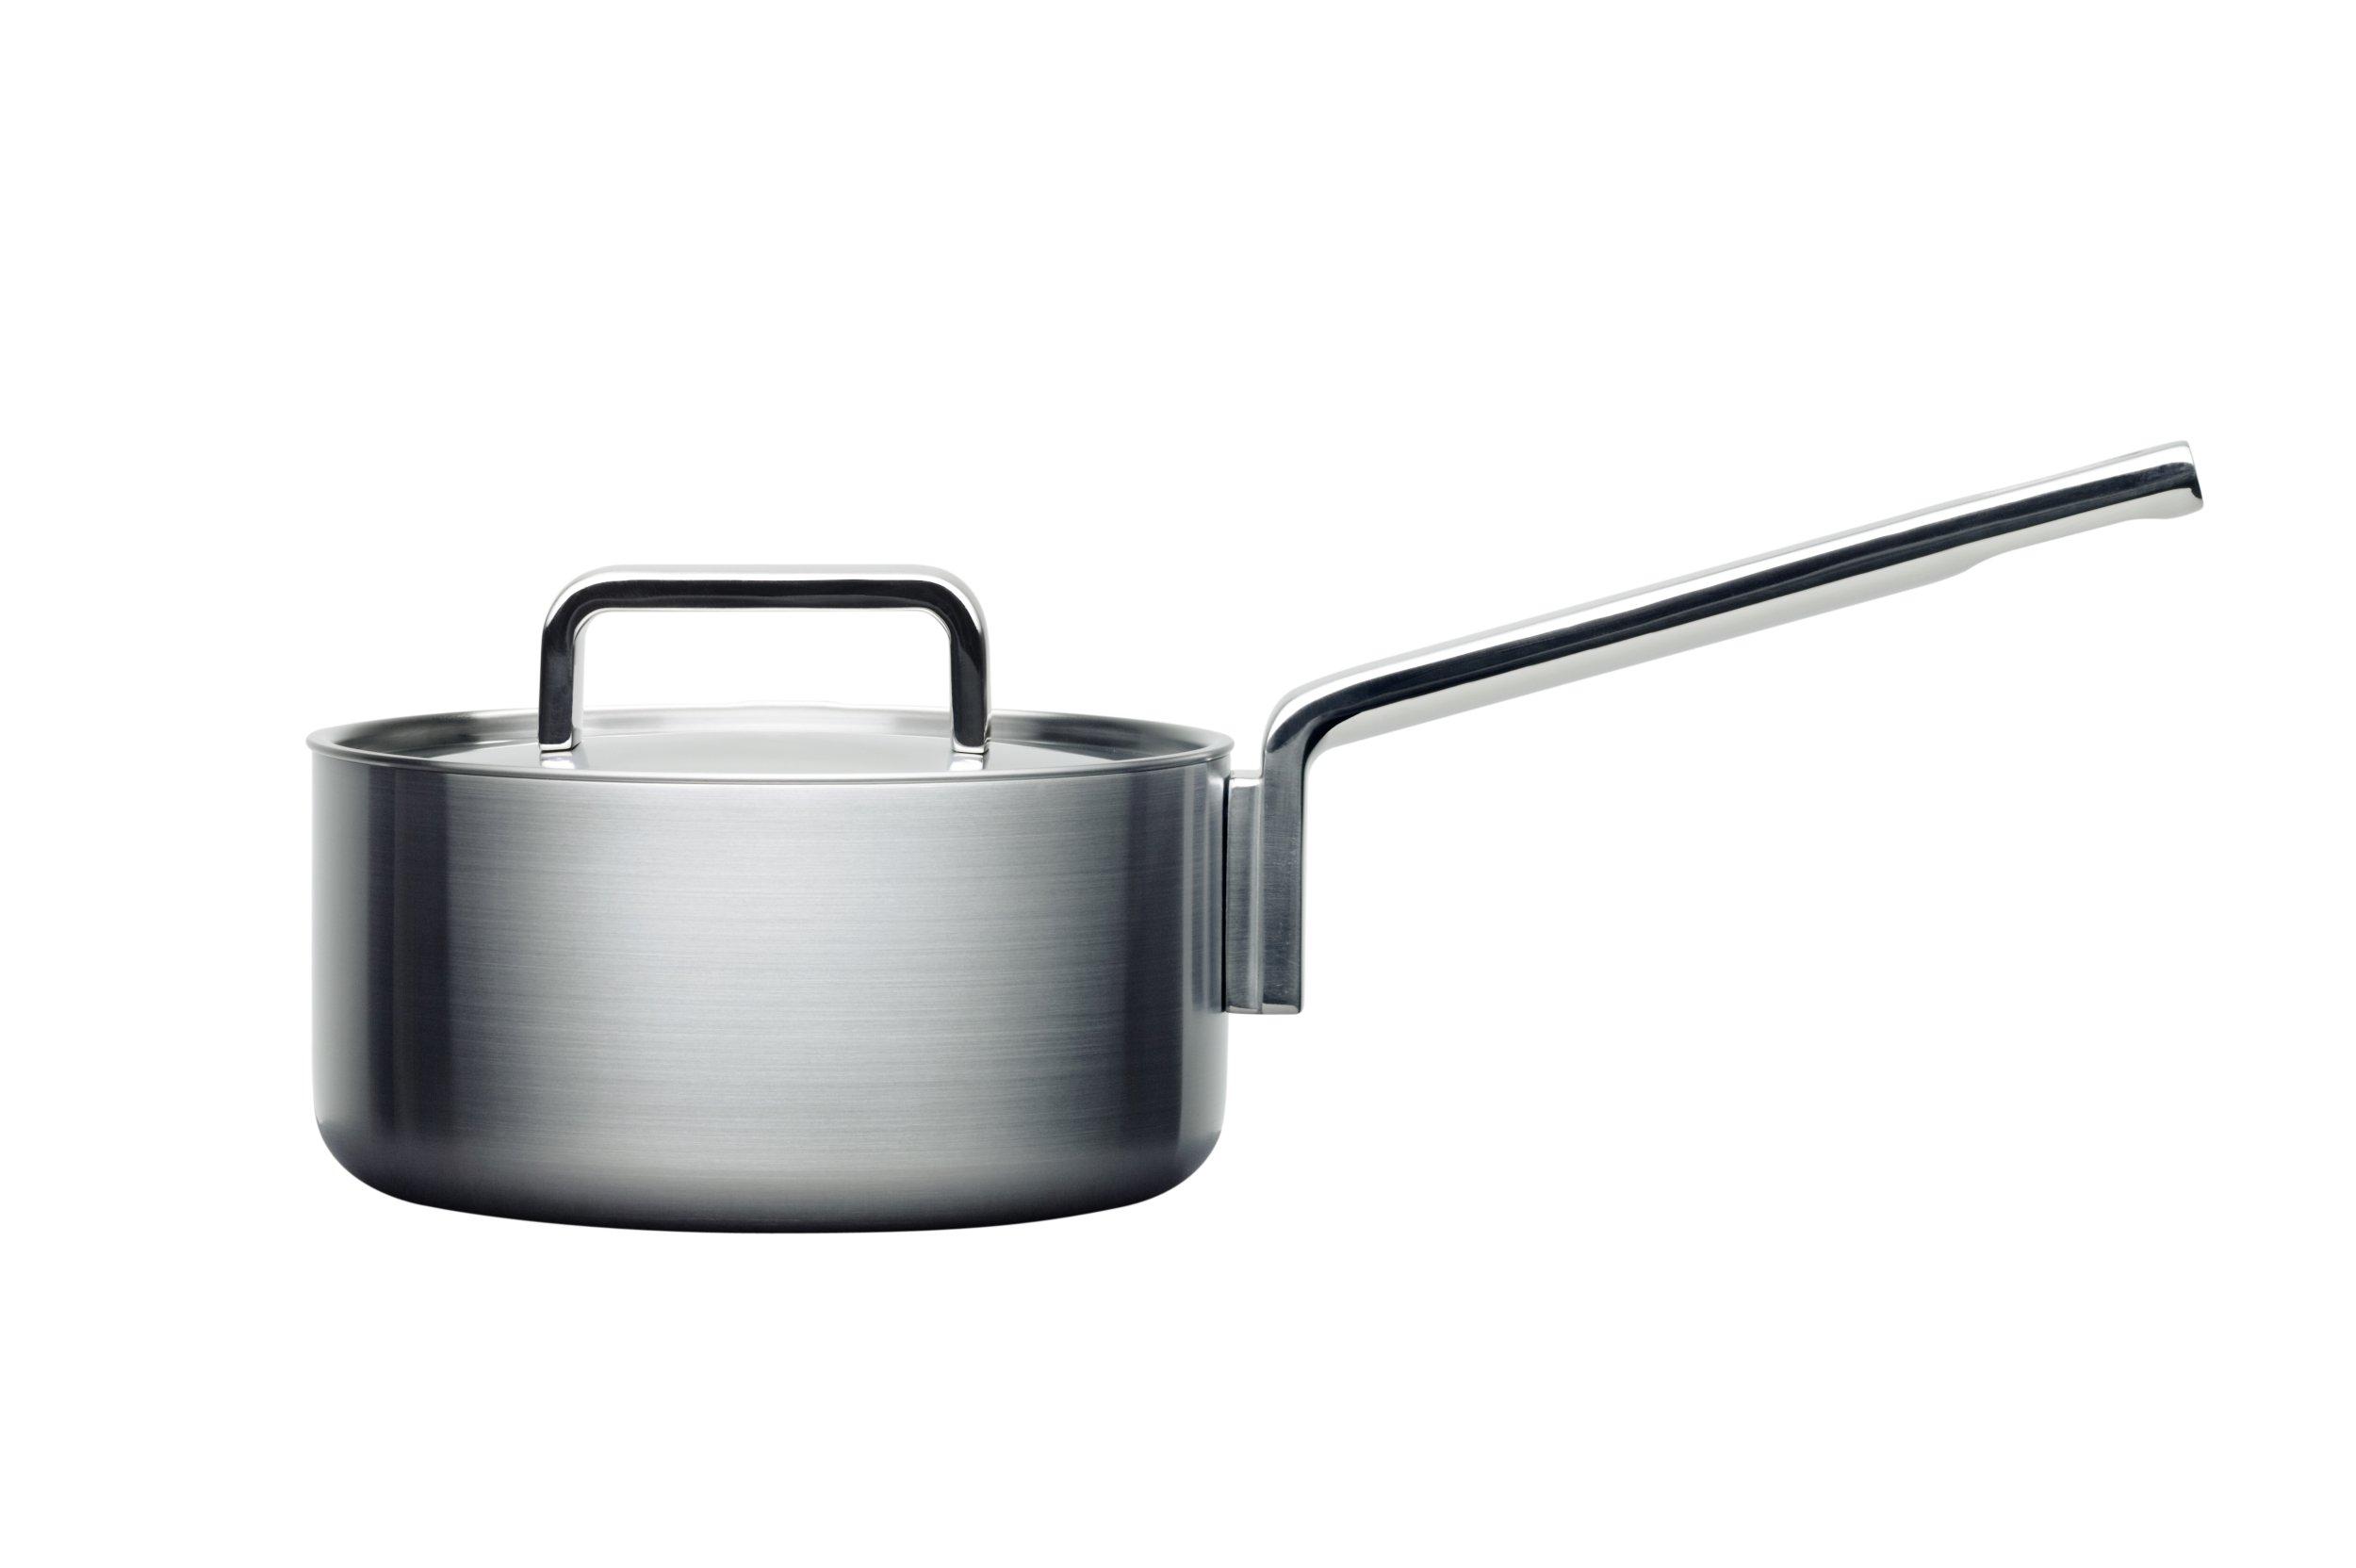 Iittala Tools 2-Quart Saucepan with Lid